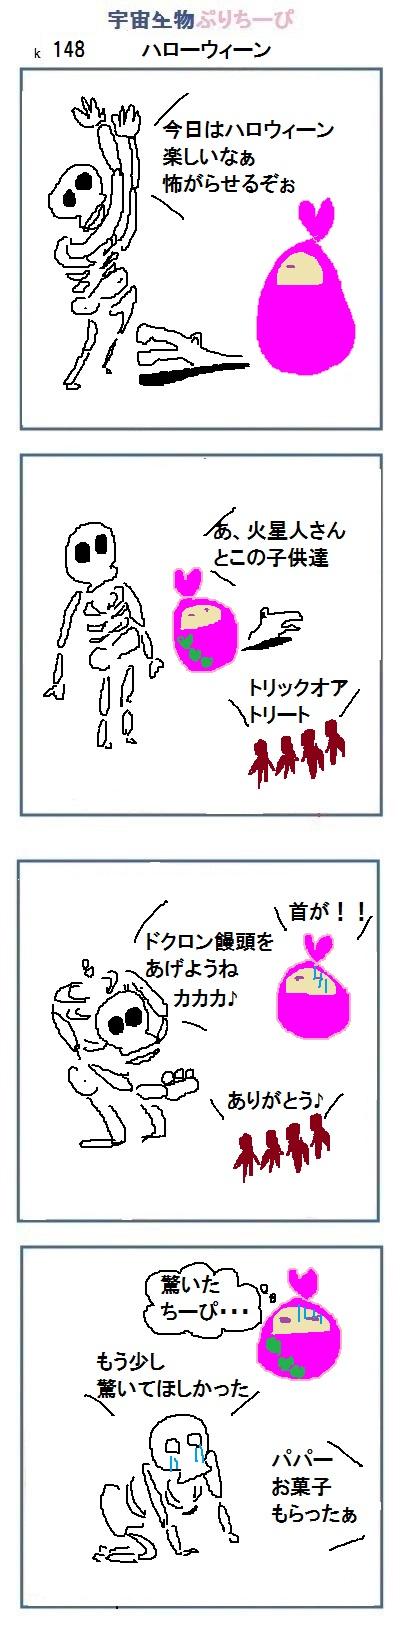 161031_k148.jpg